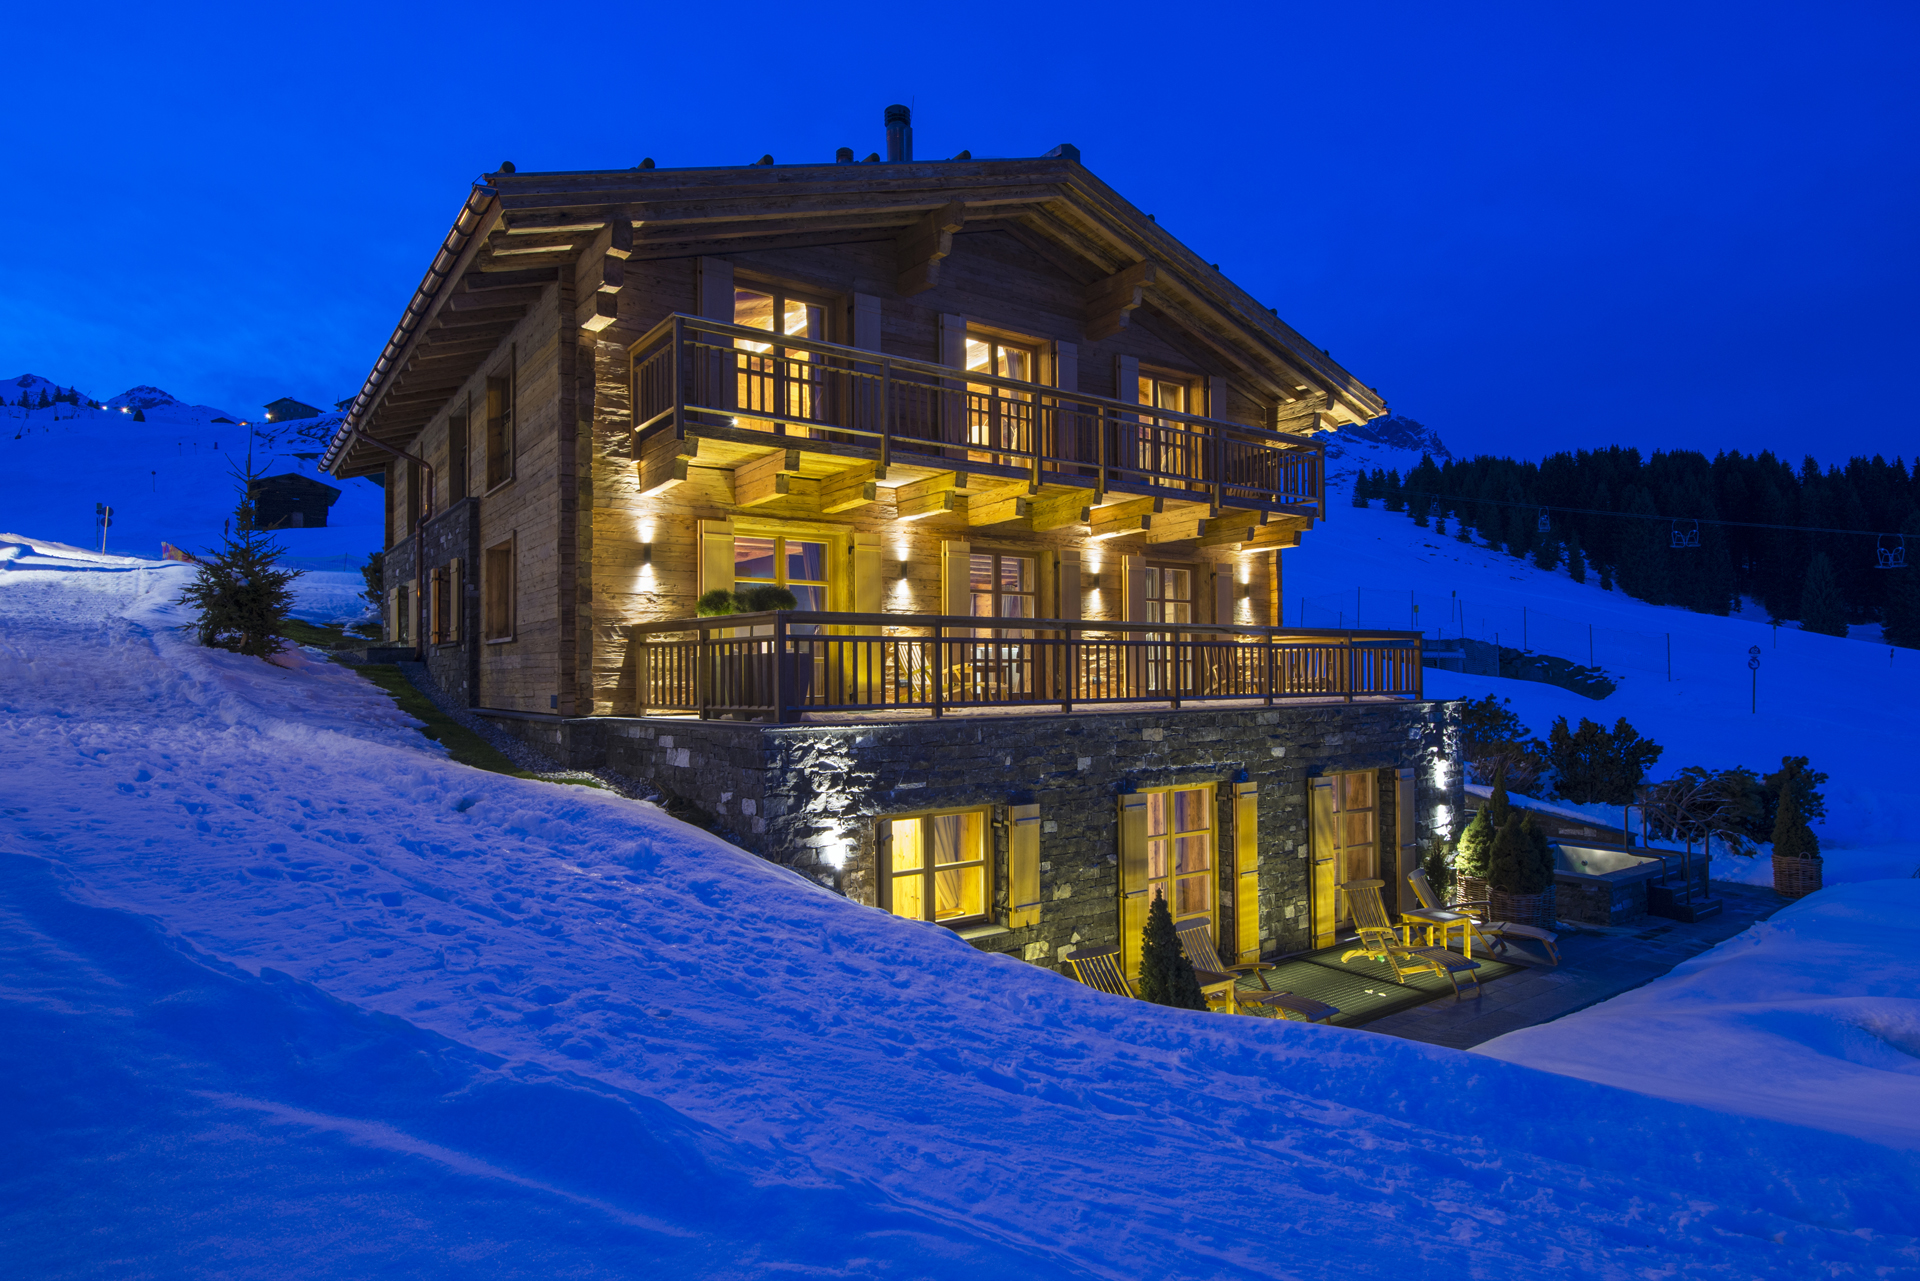 Luxury Ski Chalet uberHaus, Lech, Austrian Alps